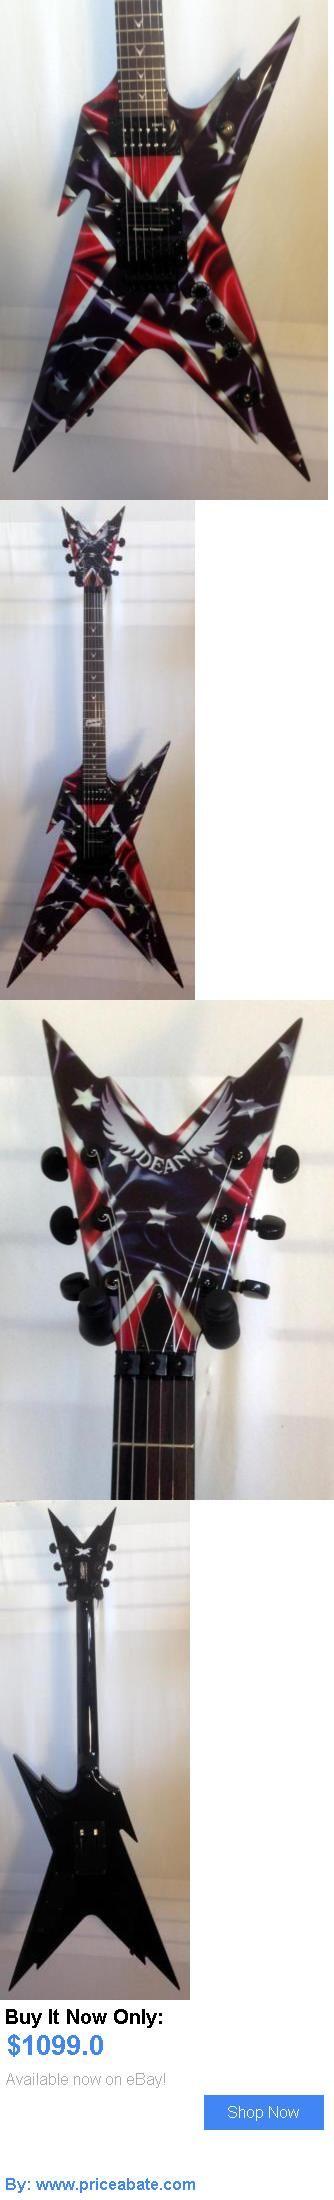 musical instruments: Dean Dimebag Razorback Rebel Electric Guitar W/ Hardshell Case BUY IT NOW ONLY: $1099.0 #priceabatemusicalinstruments OR #priceabate